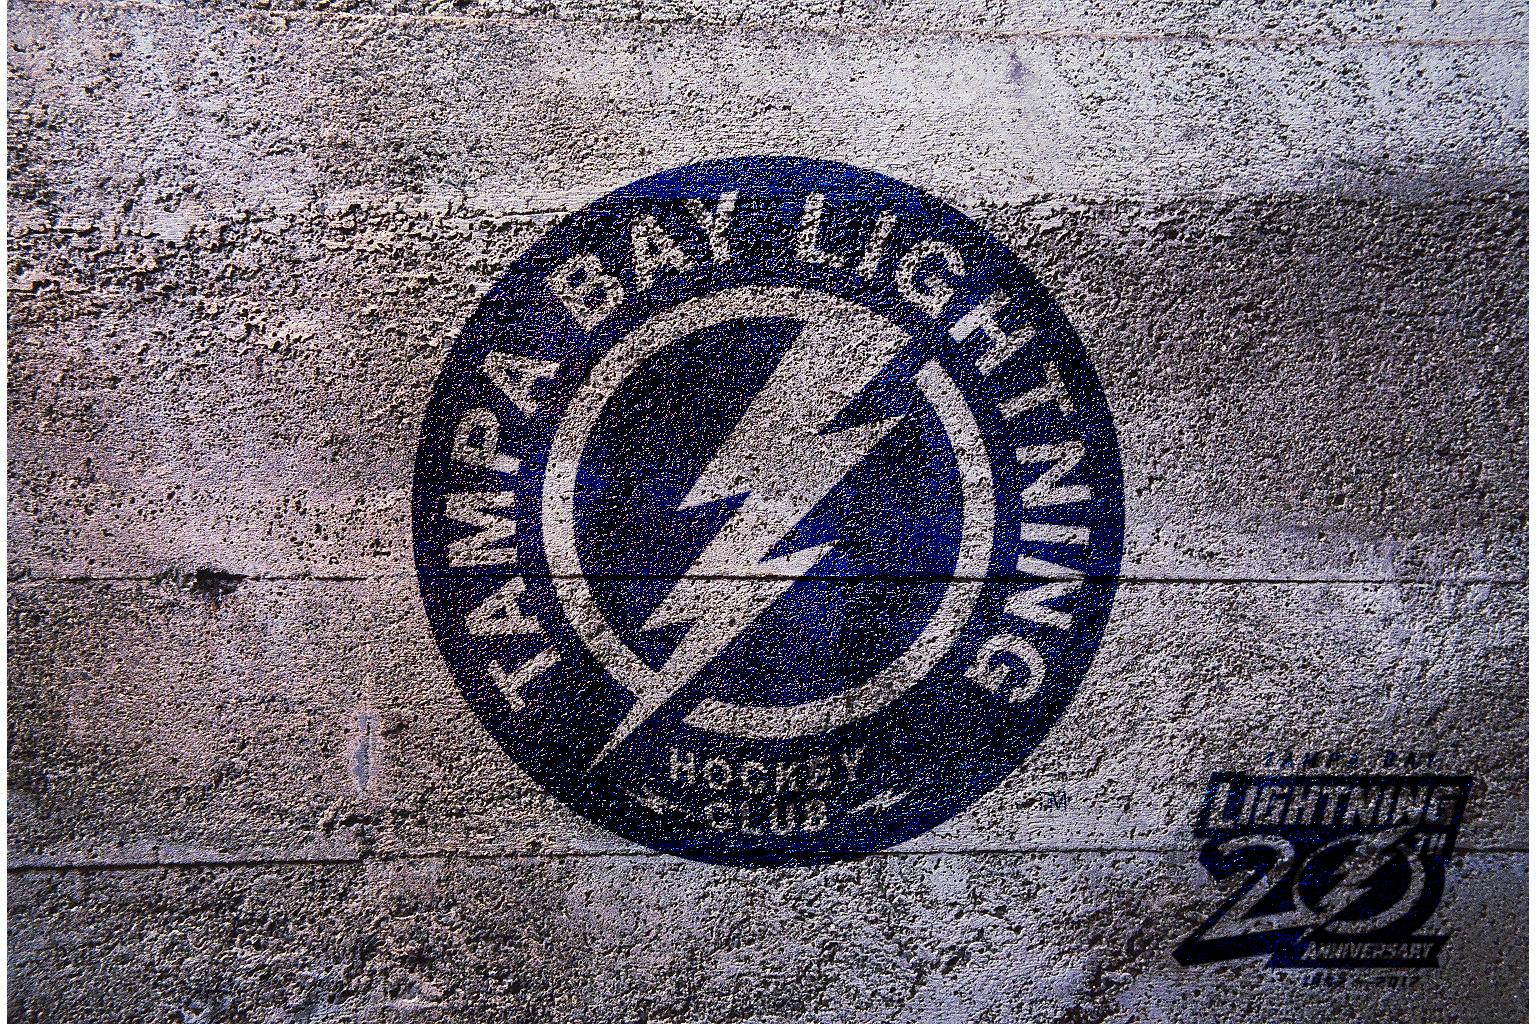 Nhl Tampa Bay Lightning Shoulder Logo 2012 By Realyze On Deviantart